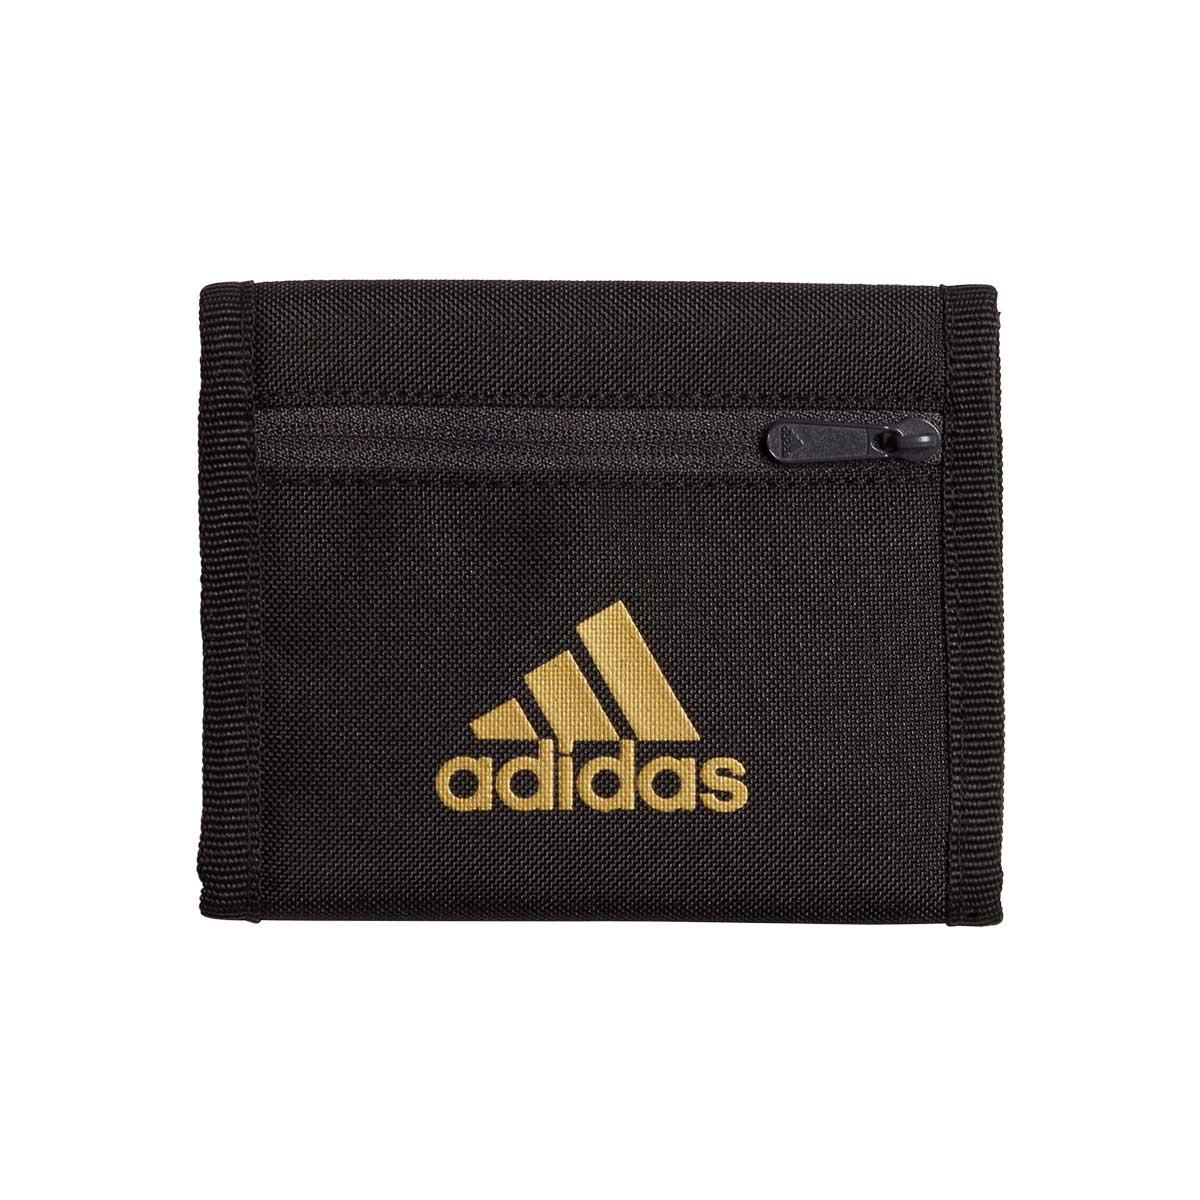 Carteira adidas Real Madrid Wallet 2019 2020